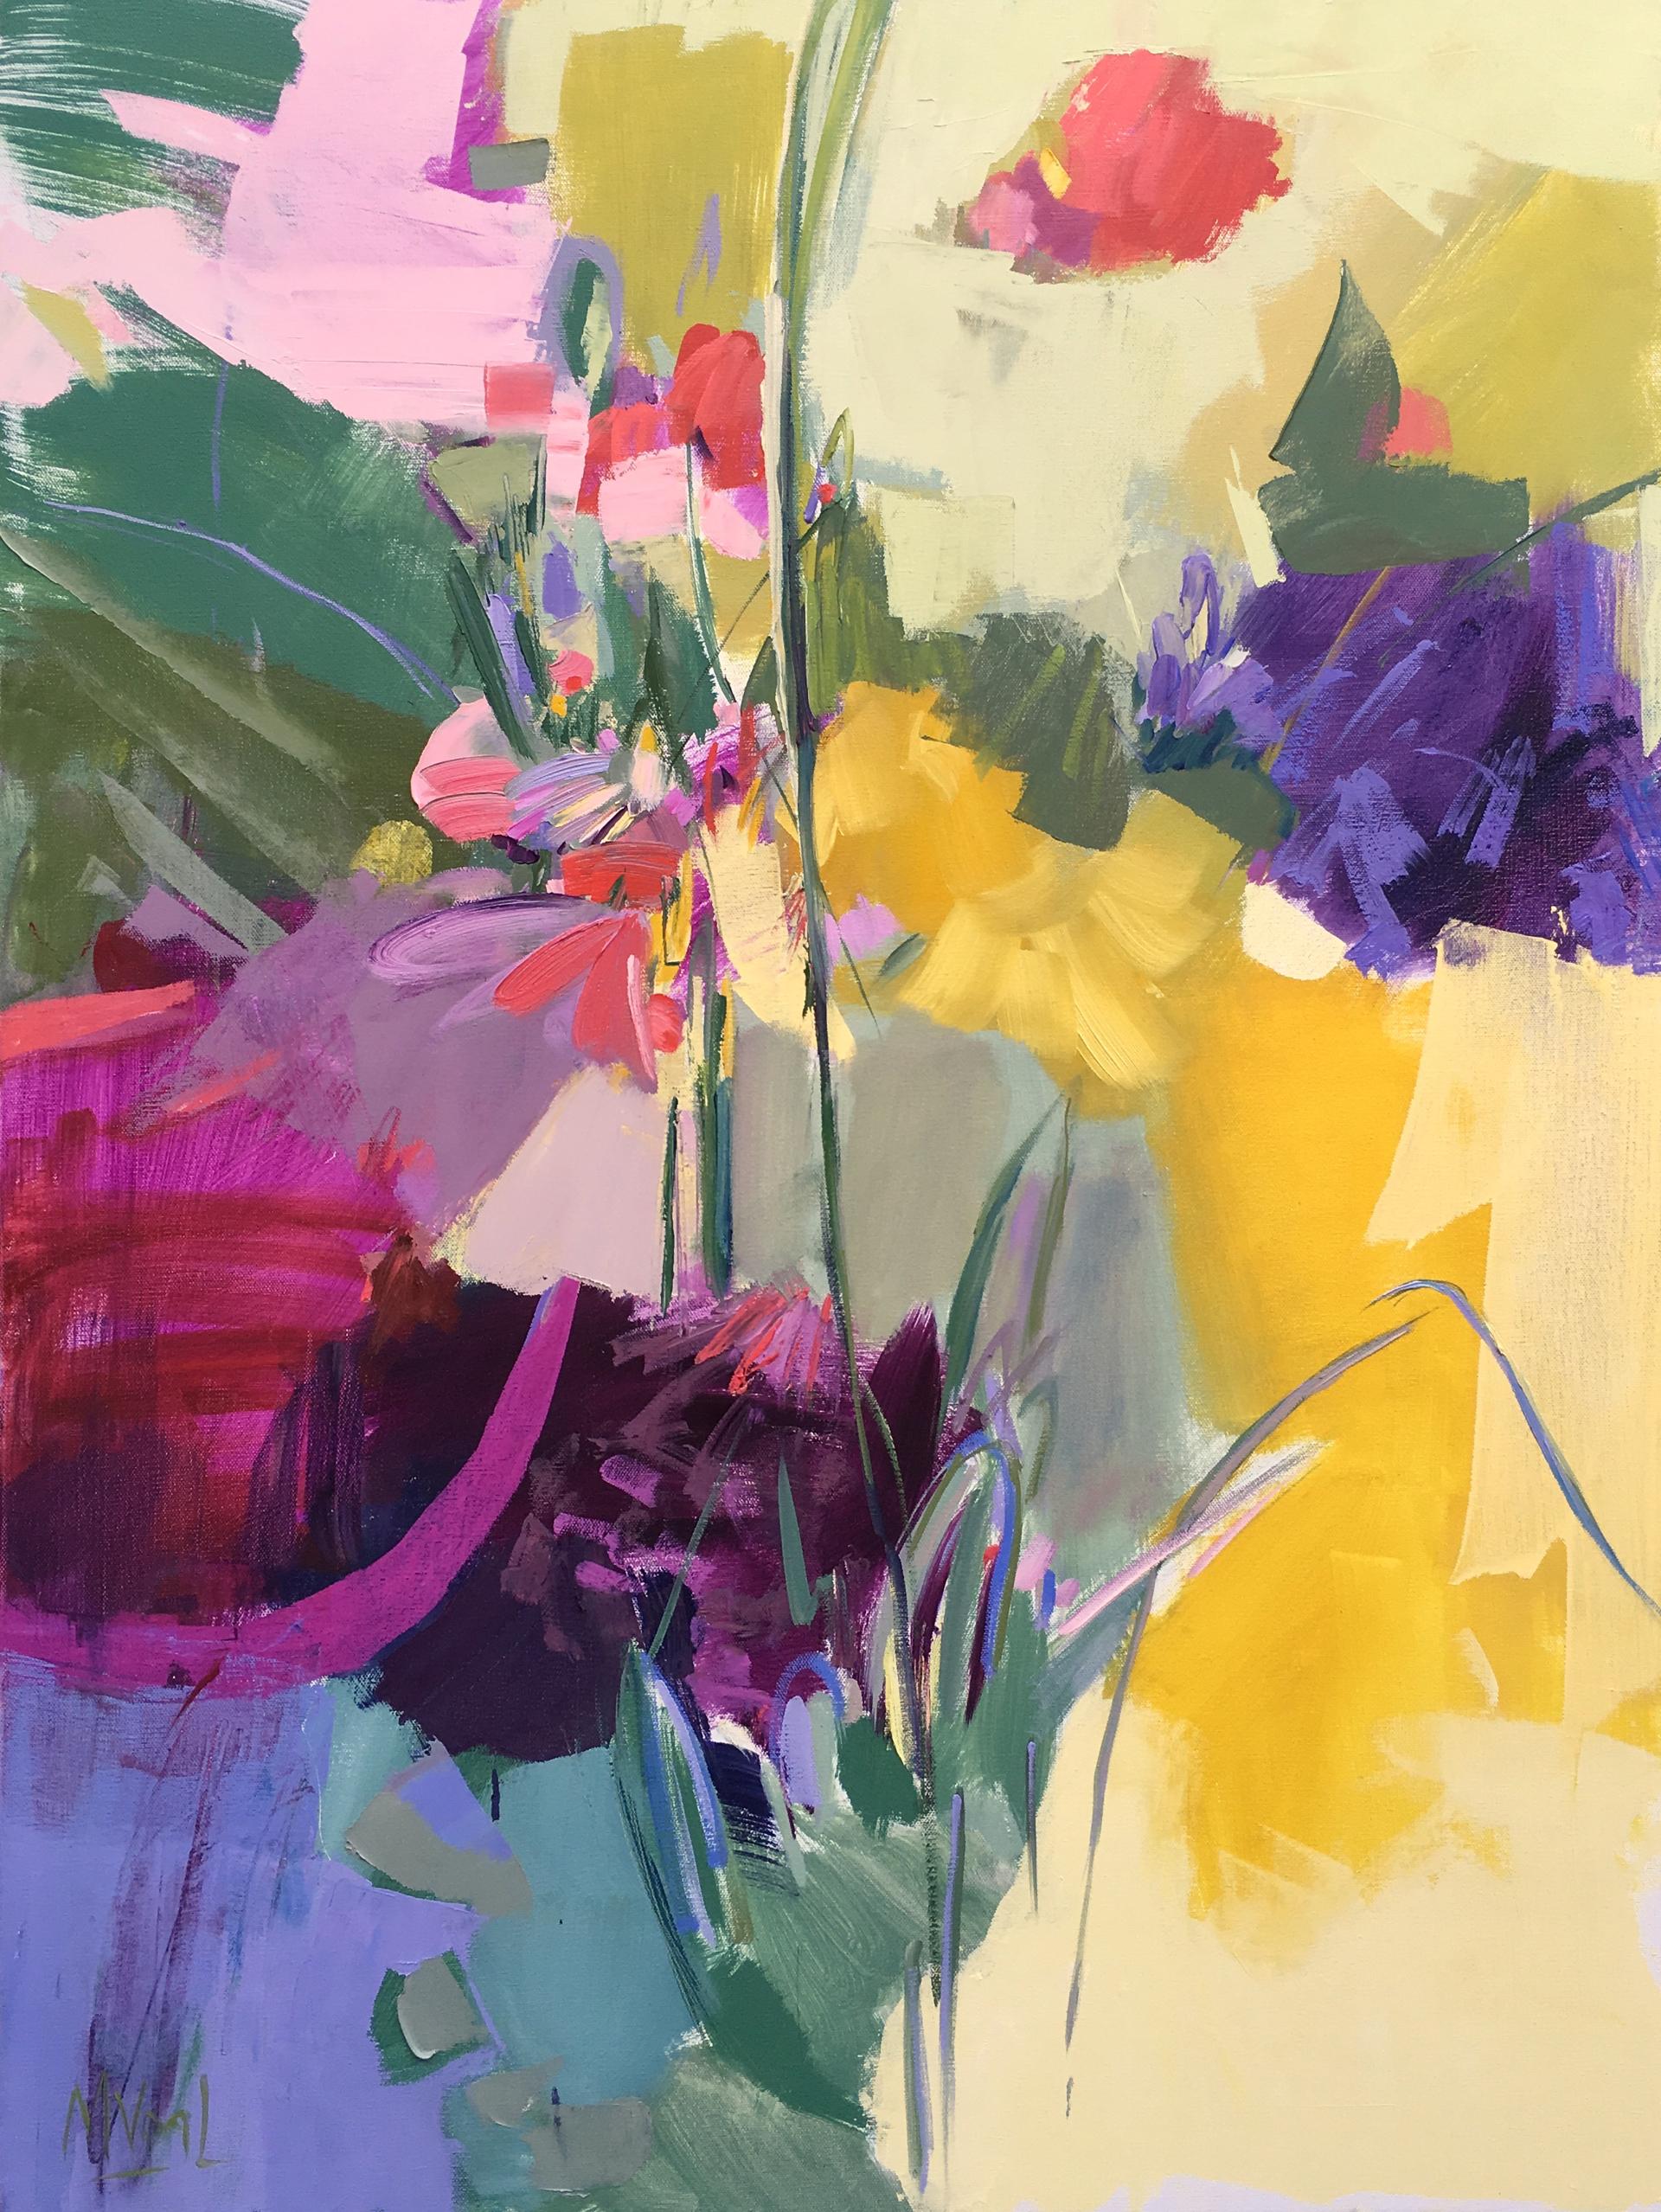 Life Gave Her Lemons by Marissa Vogl